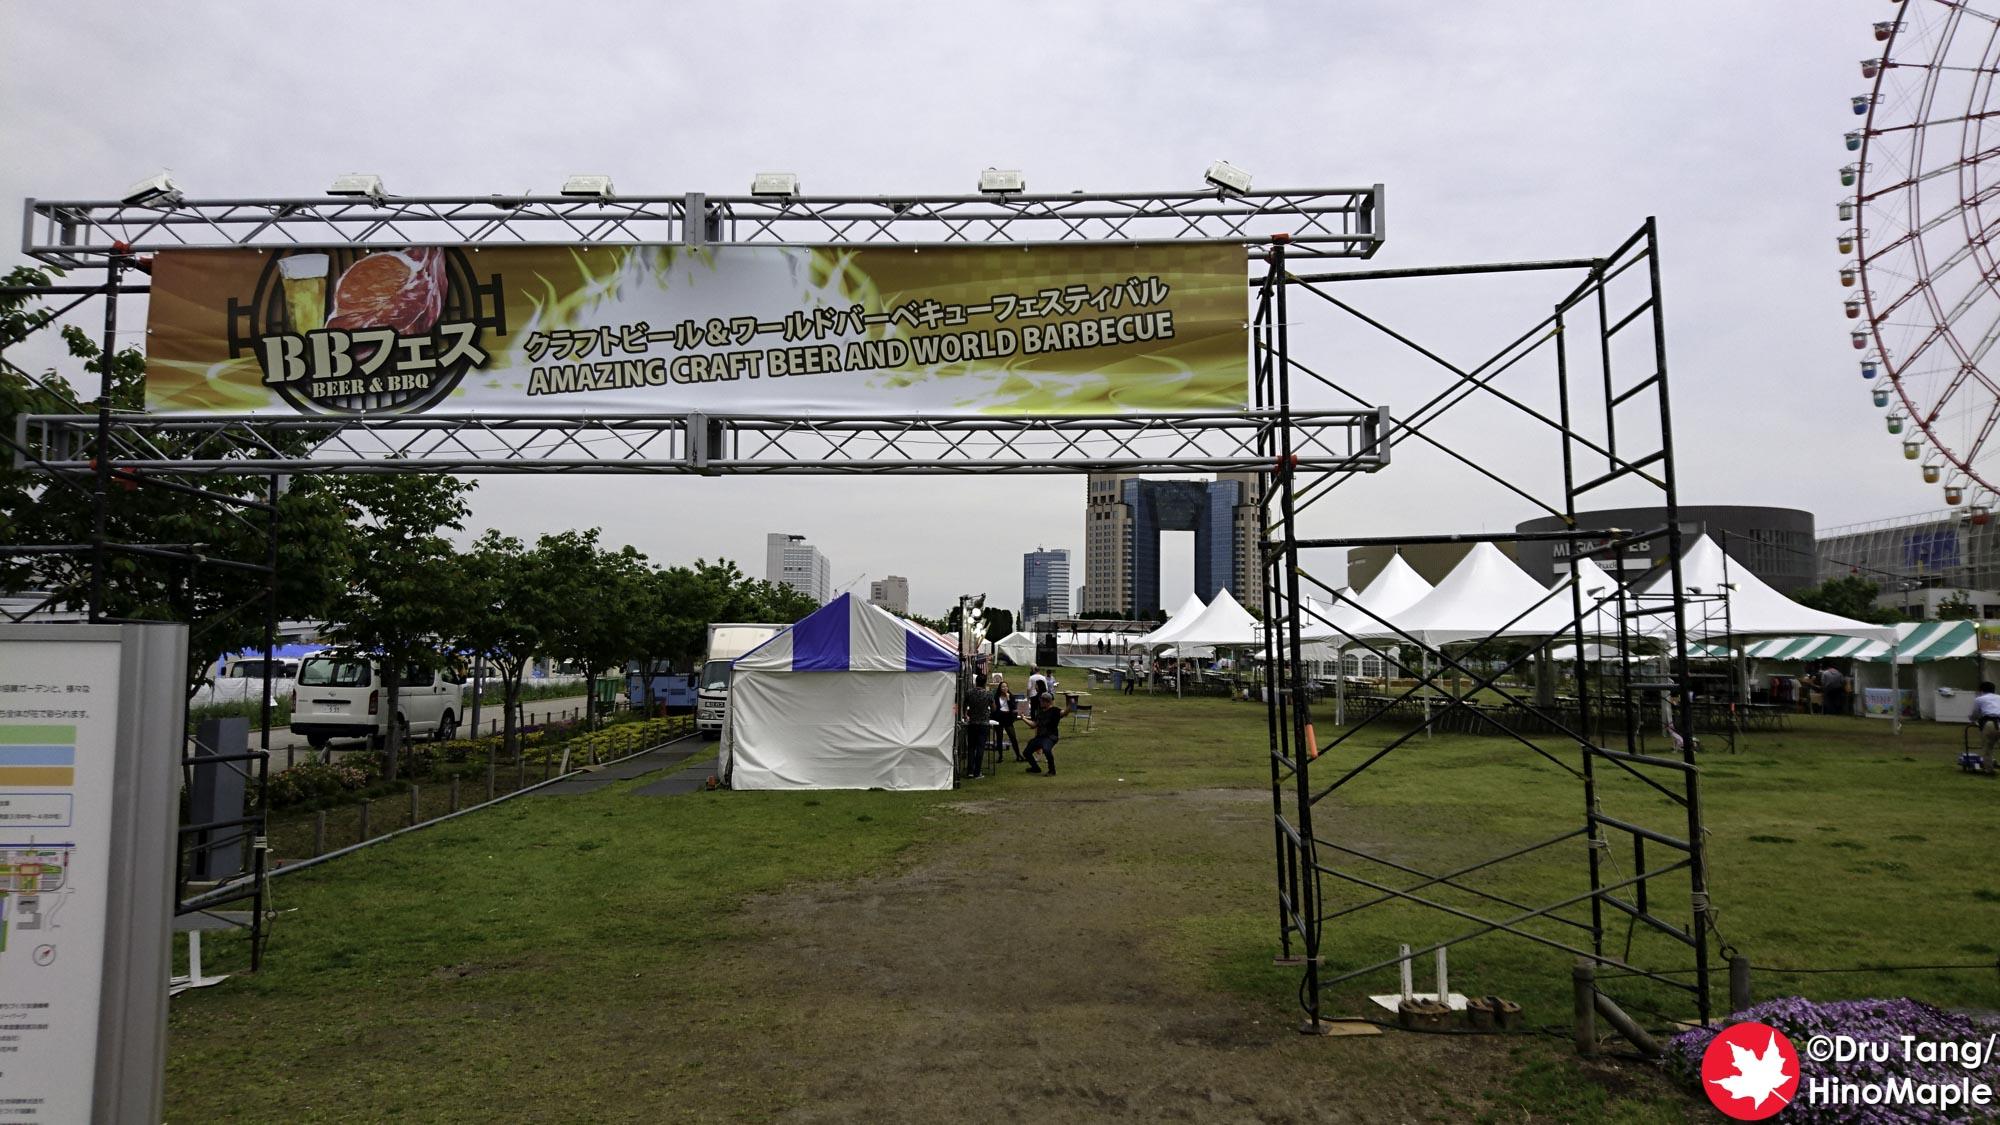 BB Fest 2018